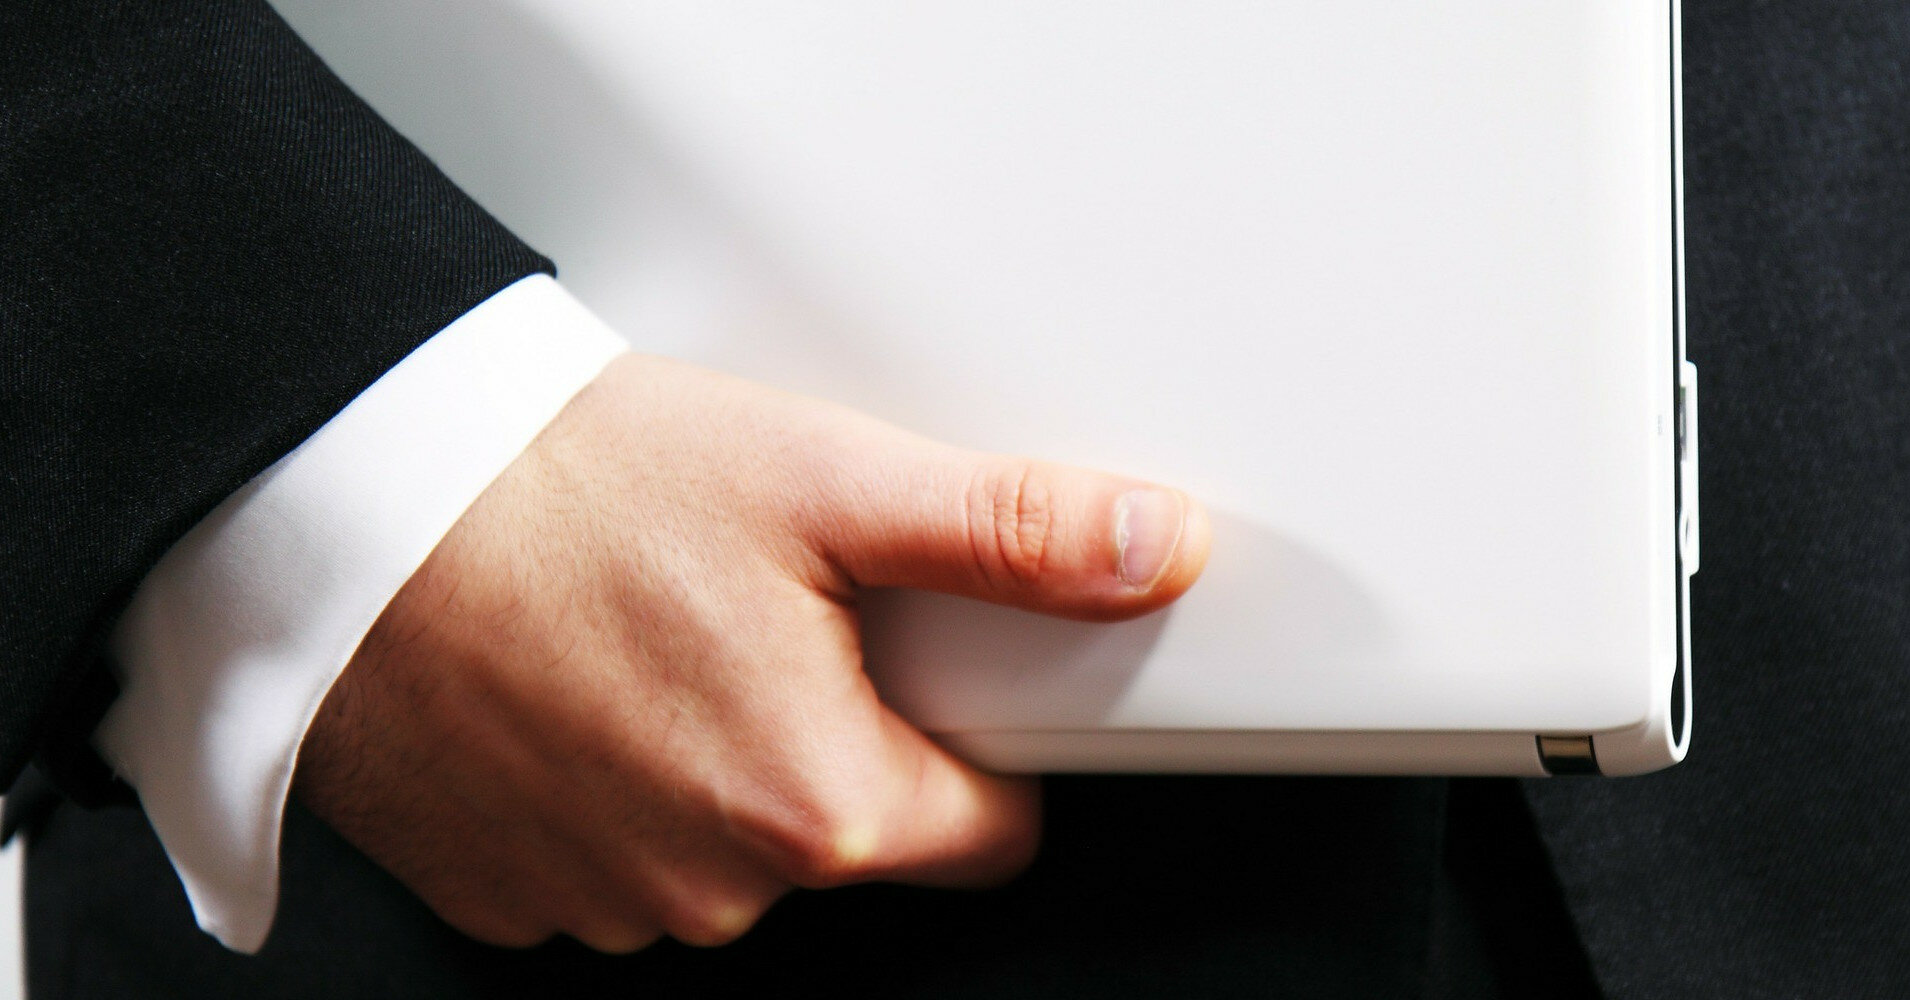 НАПК начала проверку деклараций нардепа Геруса